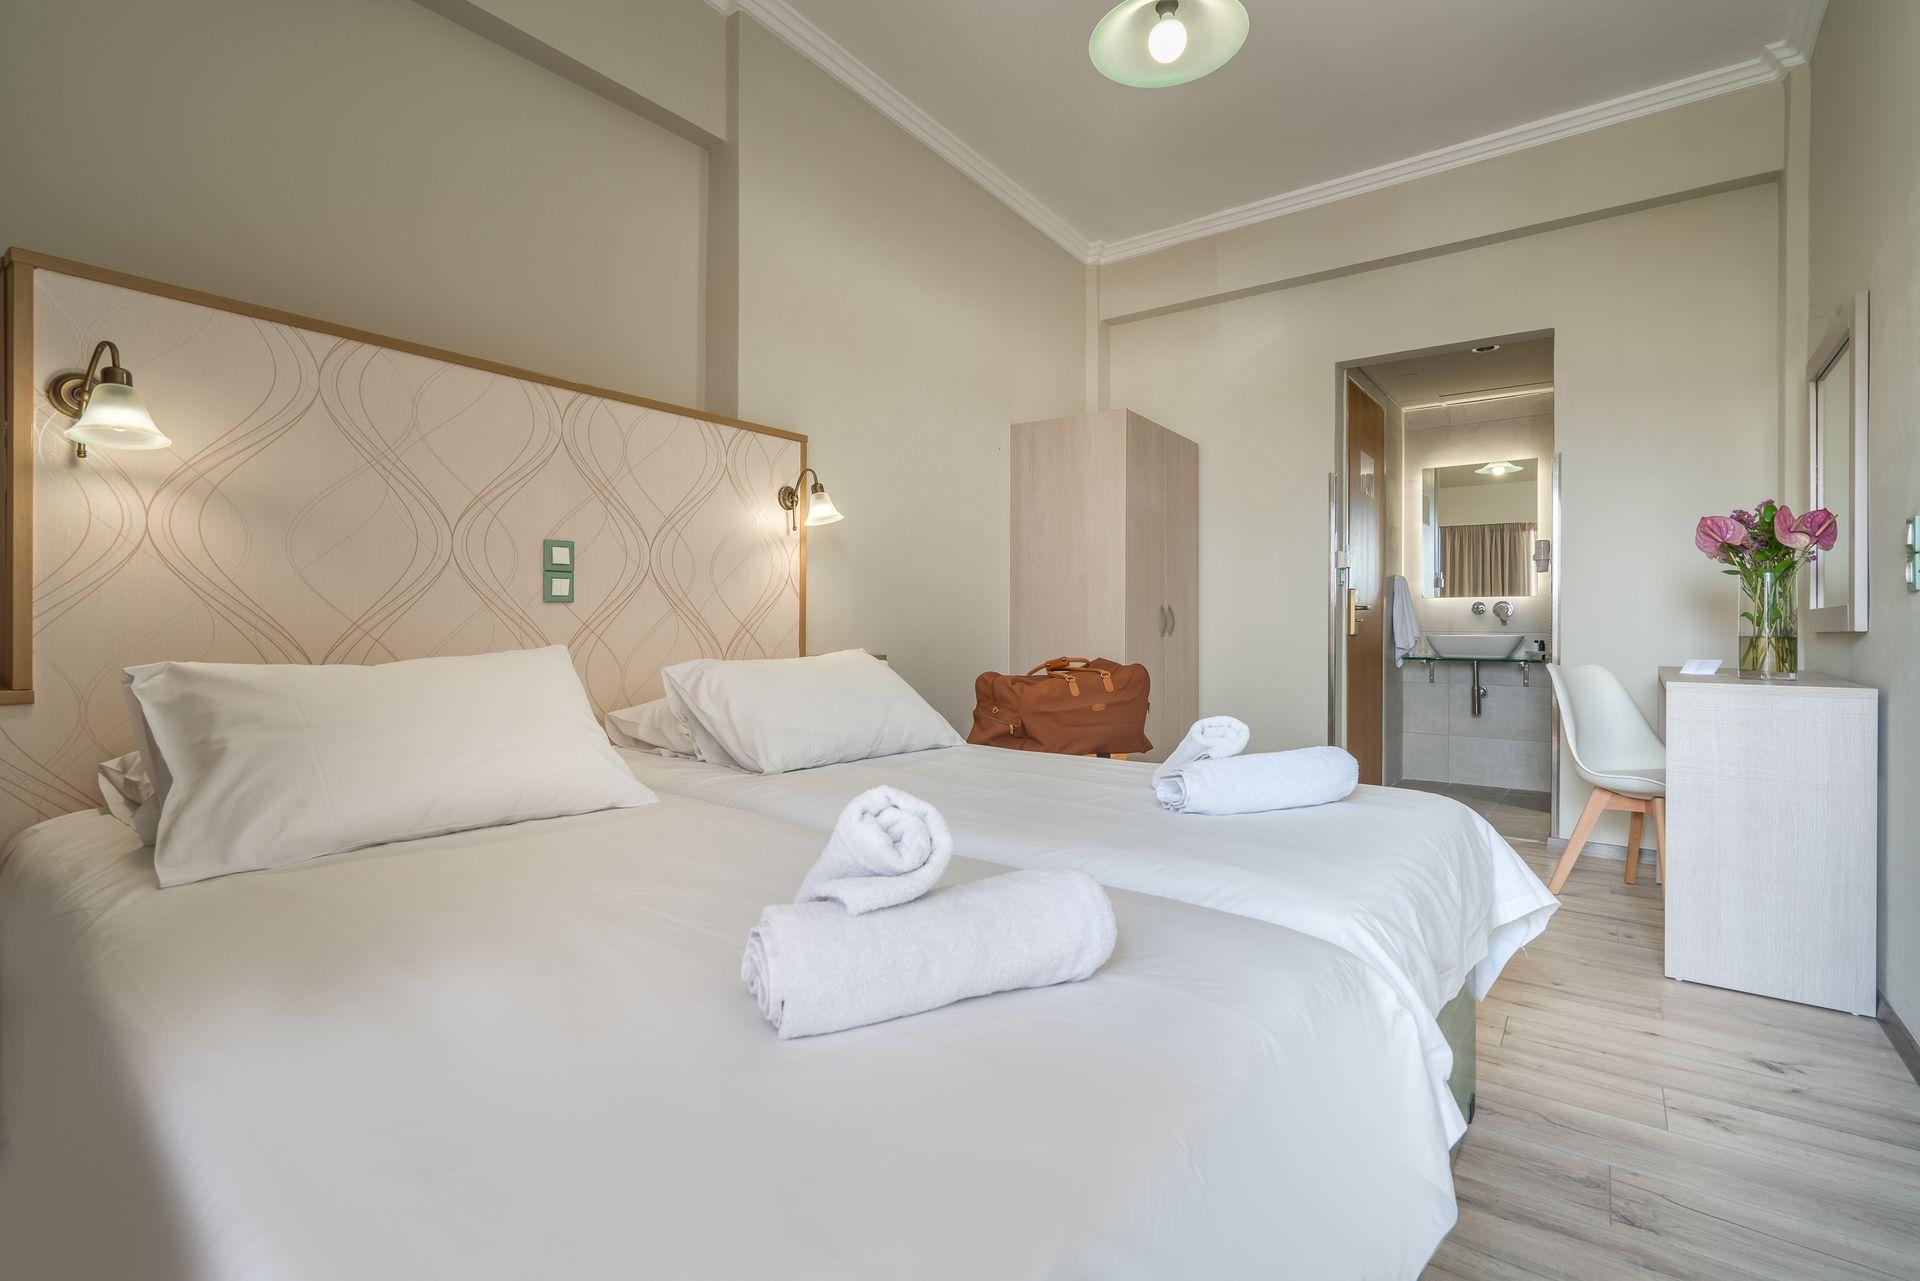 Phoenix Hotel Zante - Ζάκυνθος ✦ -29% ✦ 2 Ημέρες (1